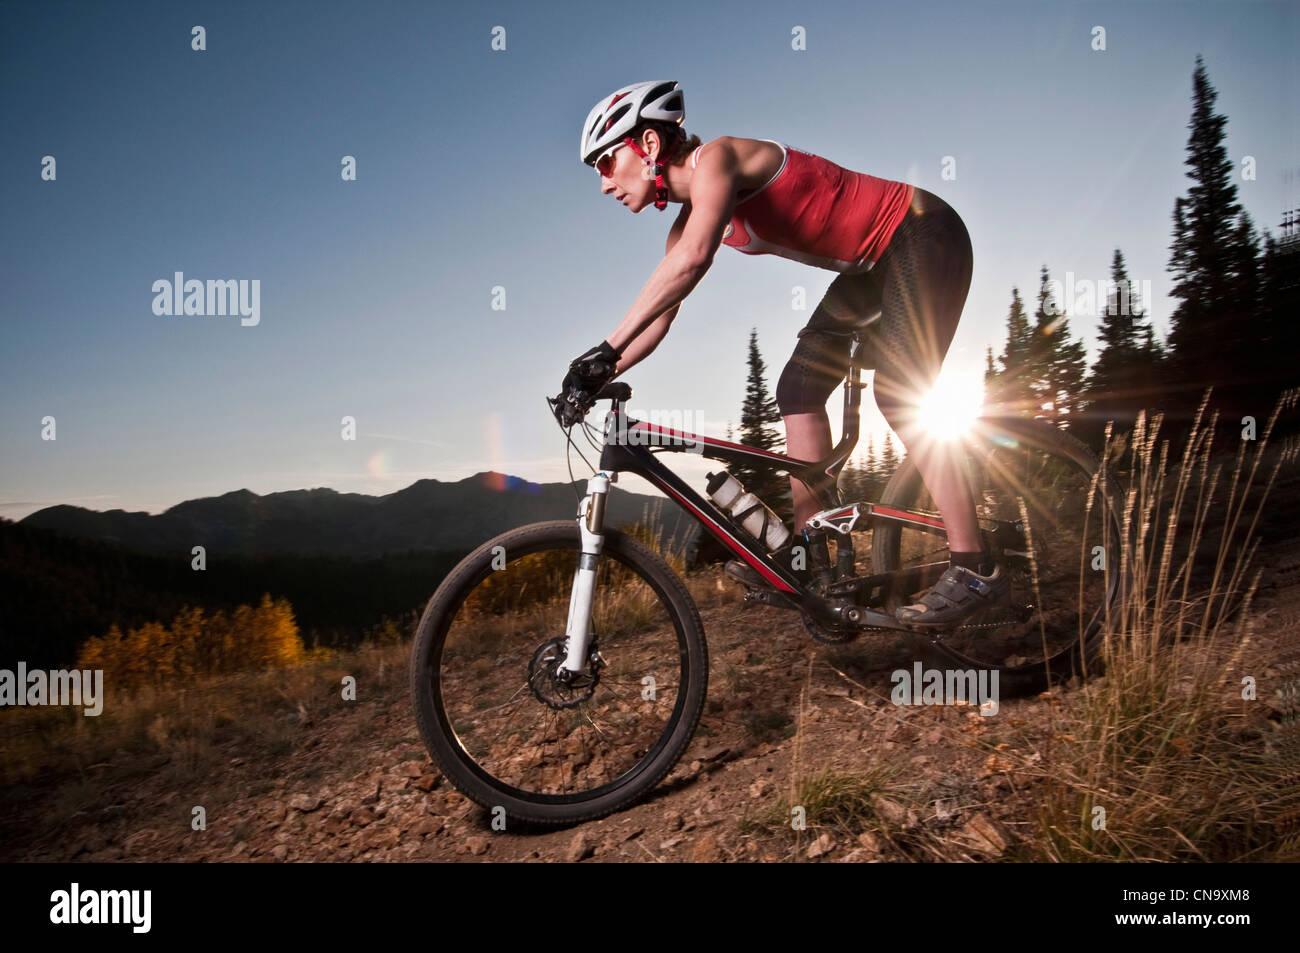 Mountain biker on dirt path - Stock Image